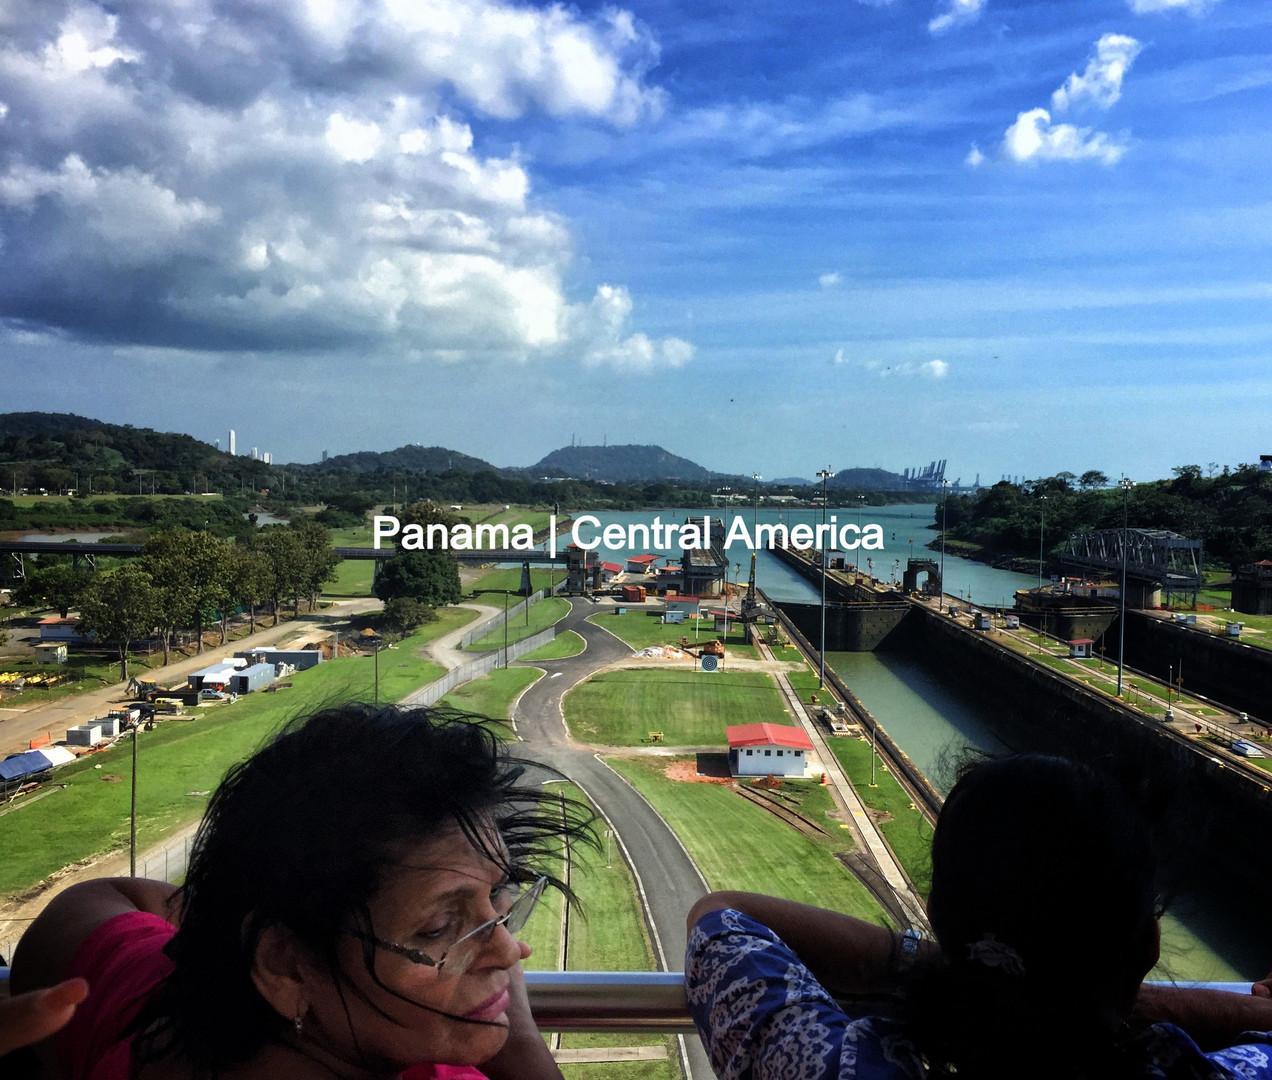 Panama | Central America